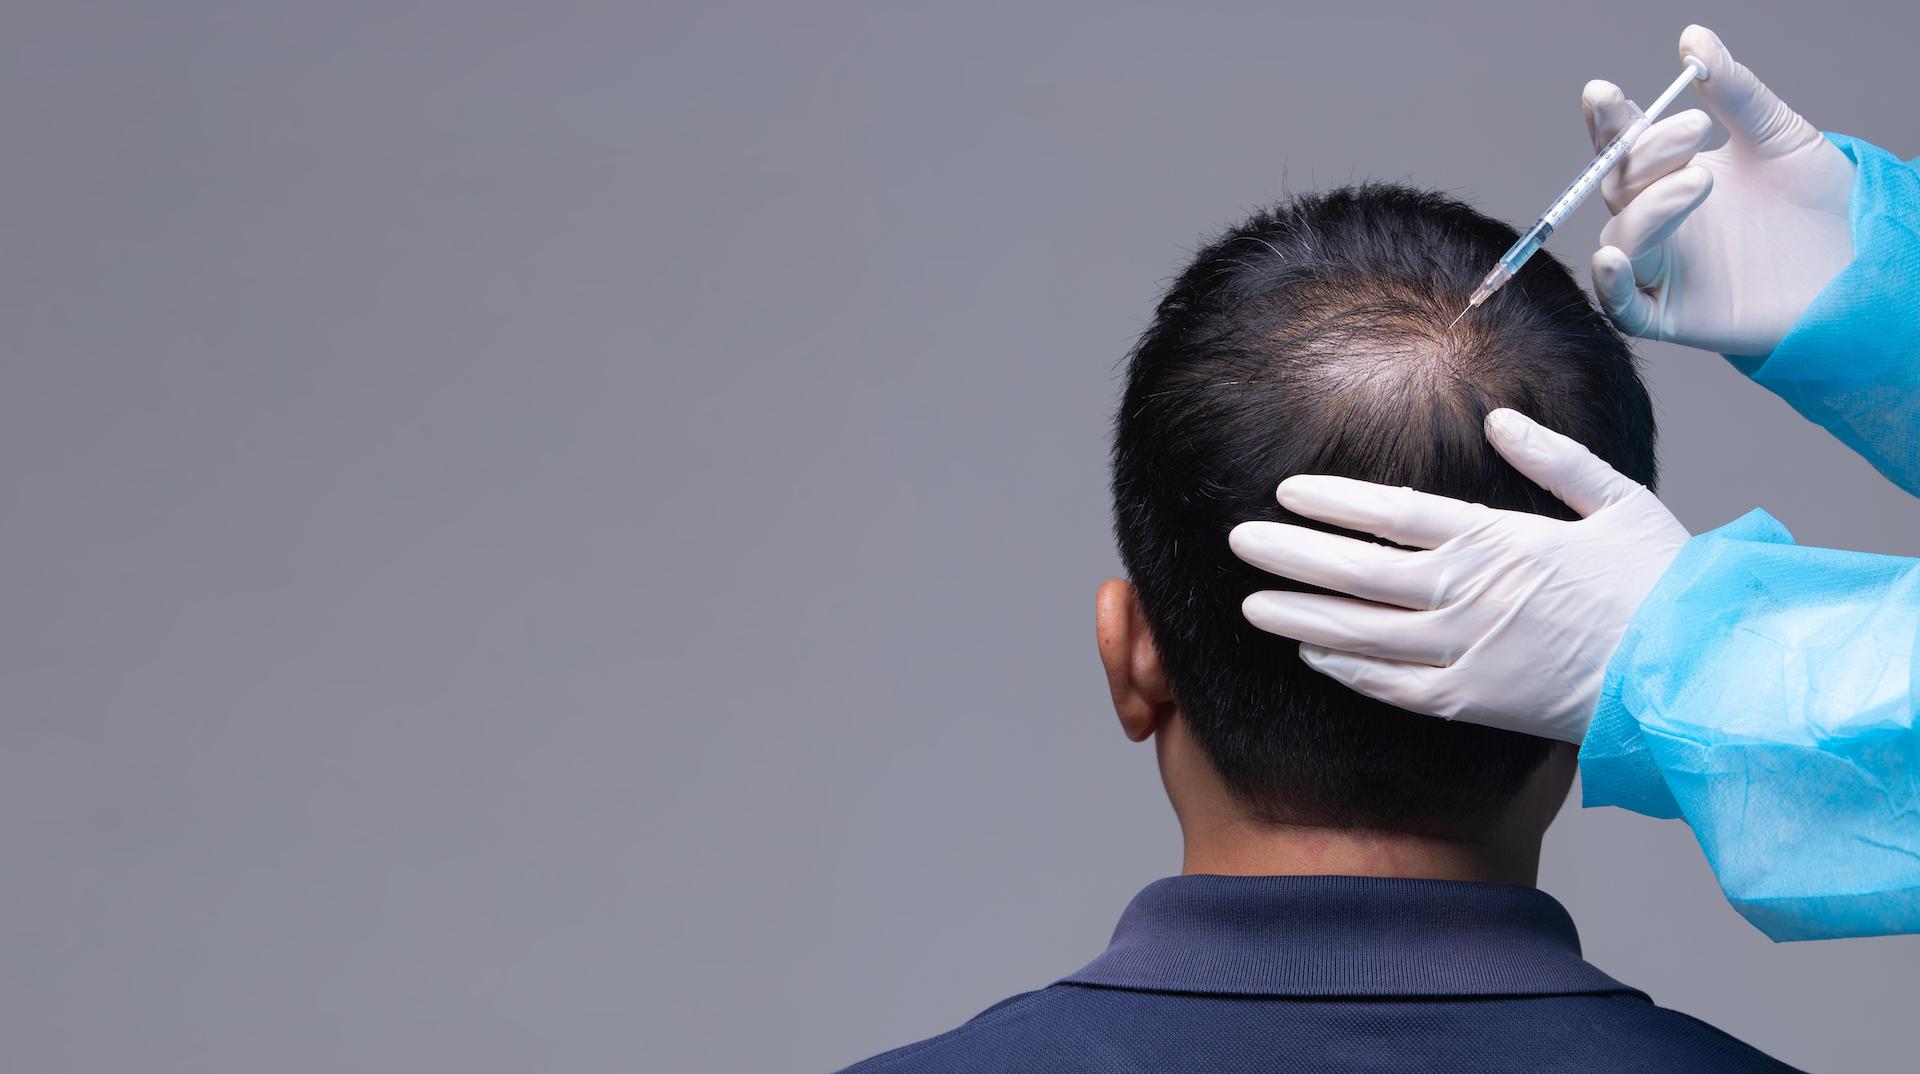 hair-restoration-torrance-hair-loss-treatment-med-spa-near-me